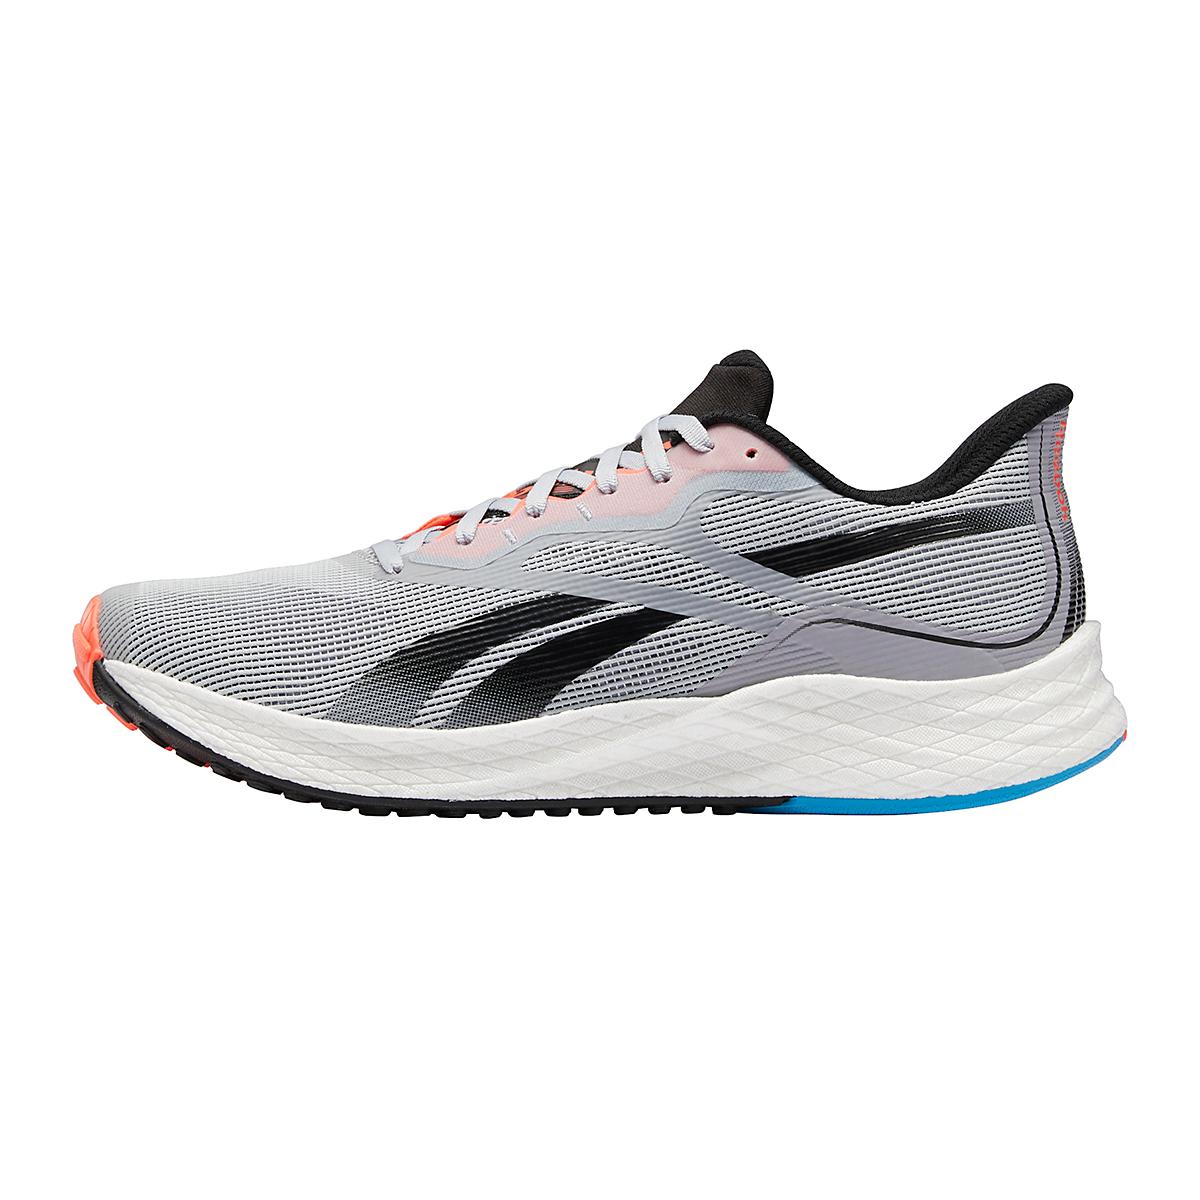 Men's Reebok Floatride Energy 3.0 Running Shoe - Color: Cold Grey/Core Black/Orange Flare - Size: 7 - Width: Regular, Cold Grey/Core Black/Orange Flare, large, image 2